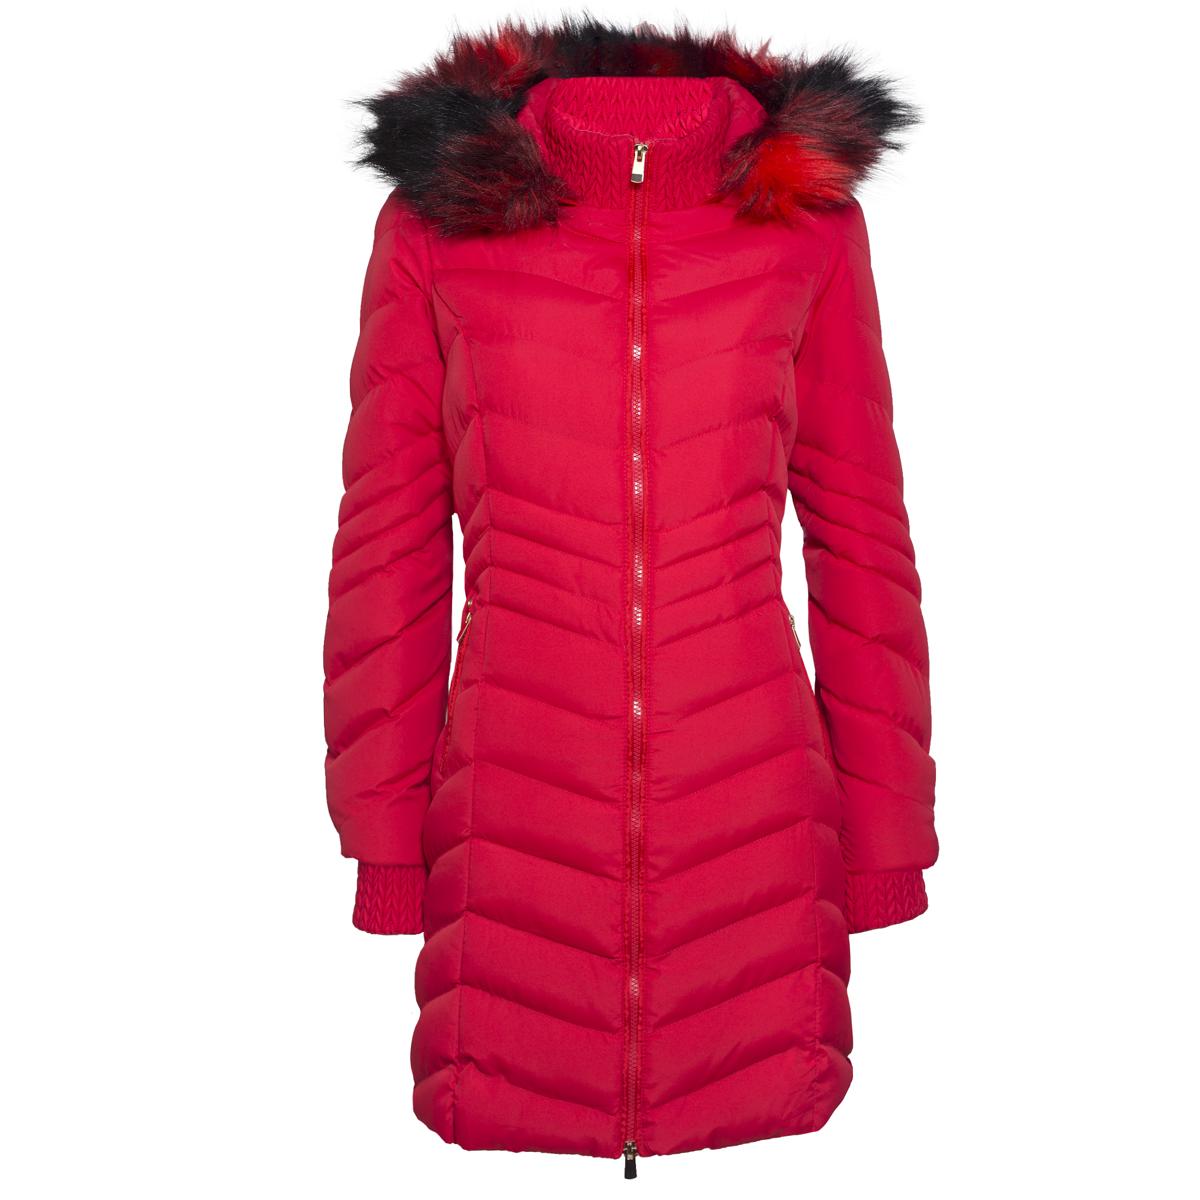 Ženska bunda, rdeča